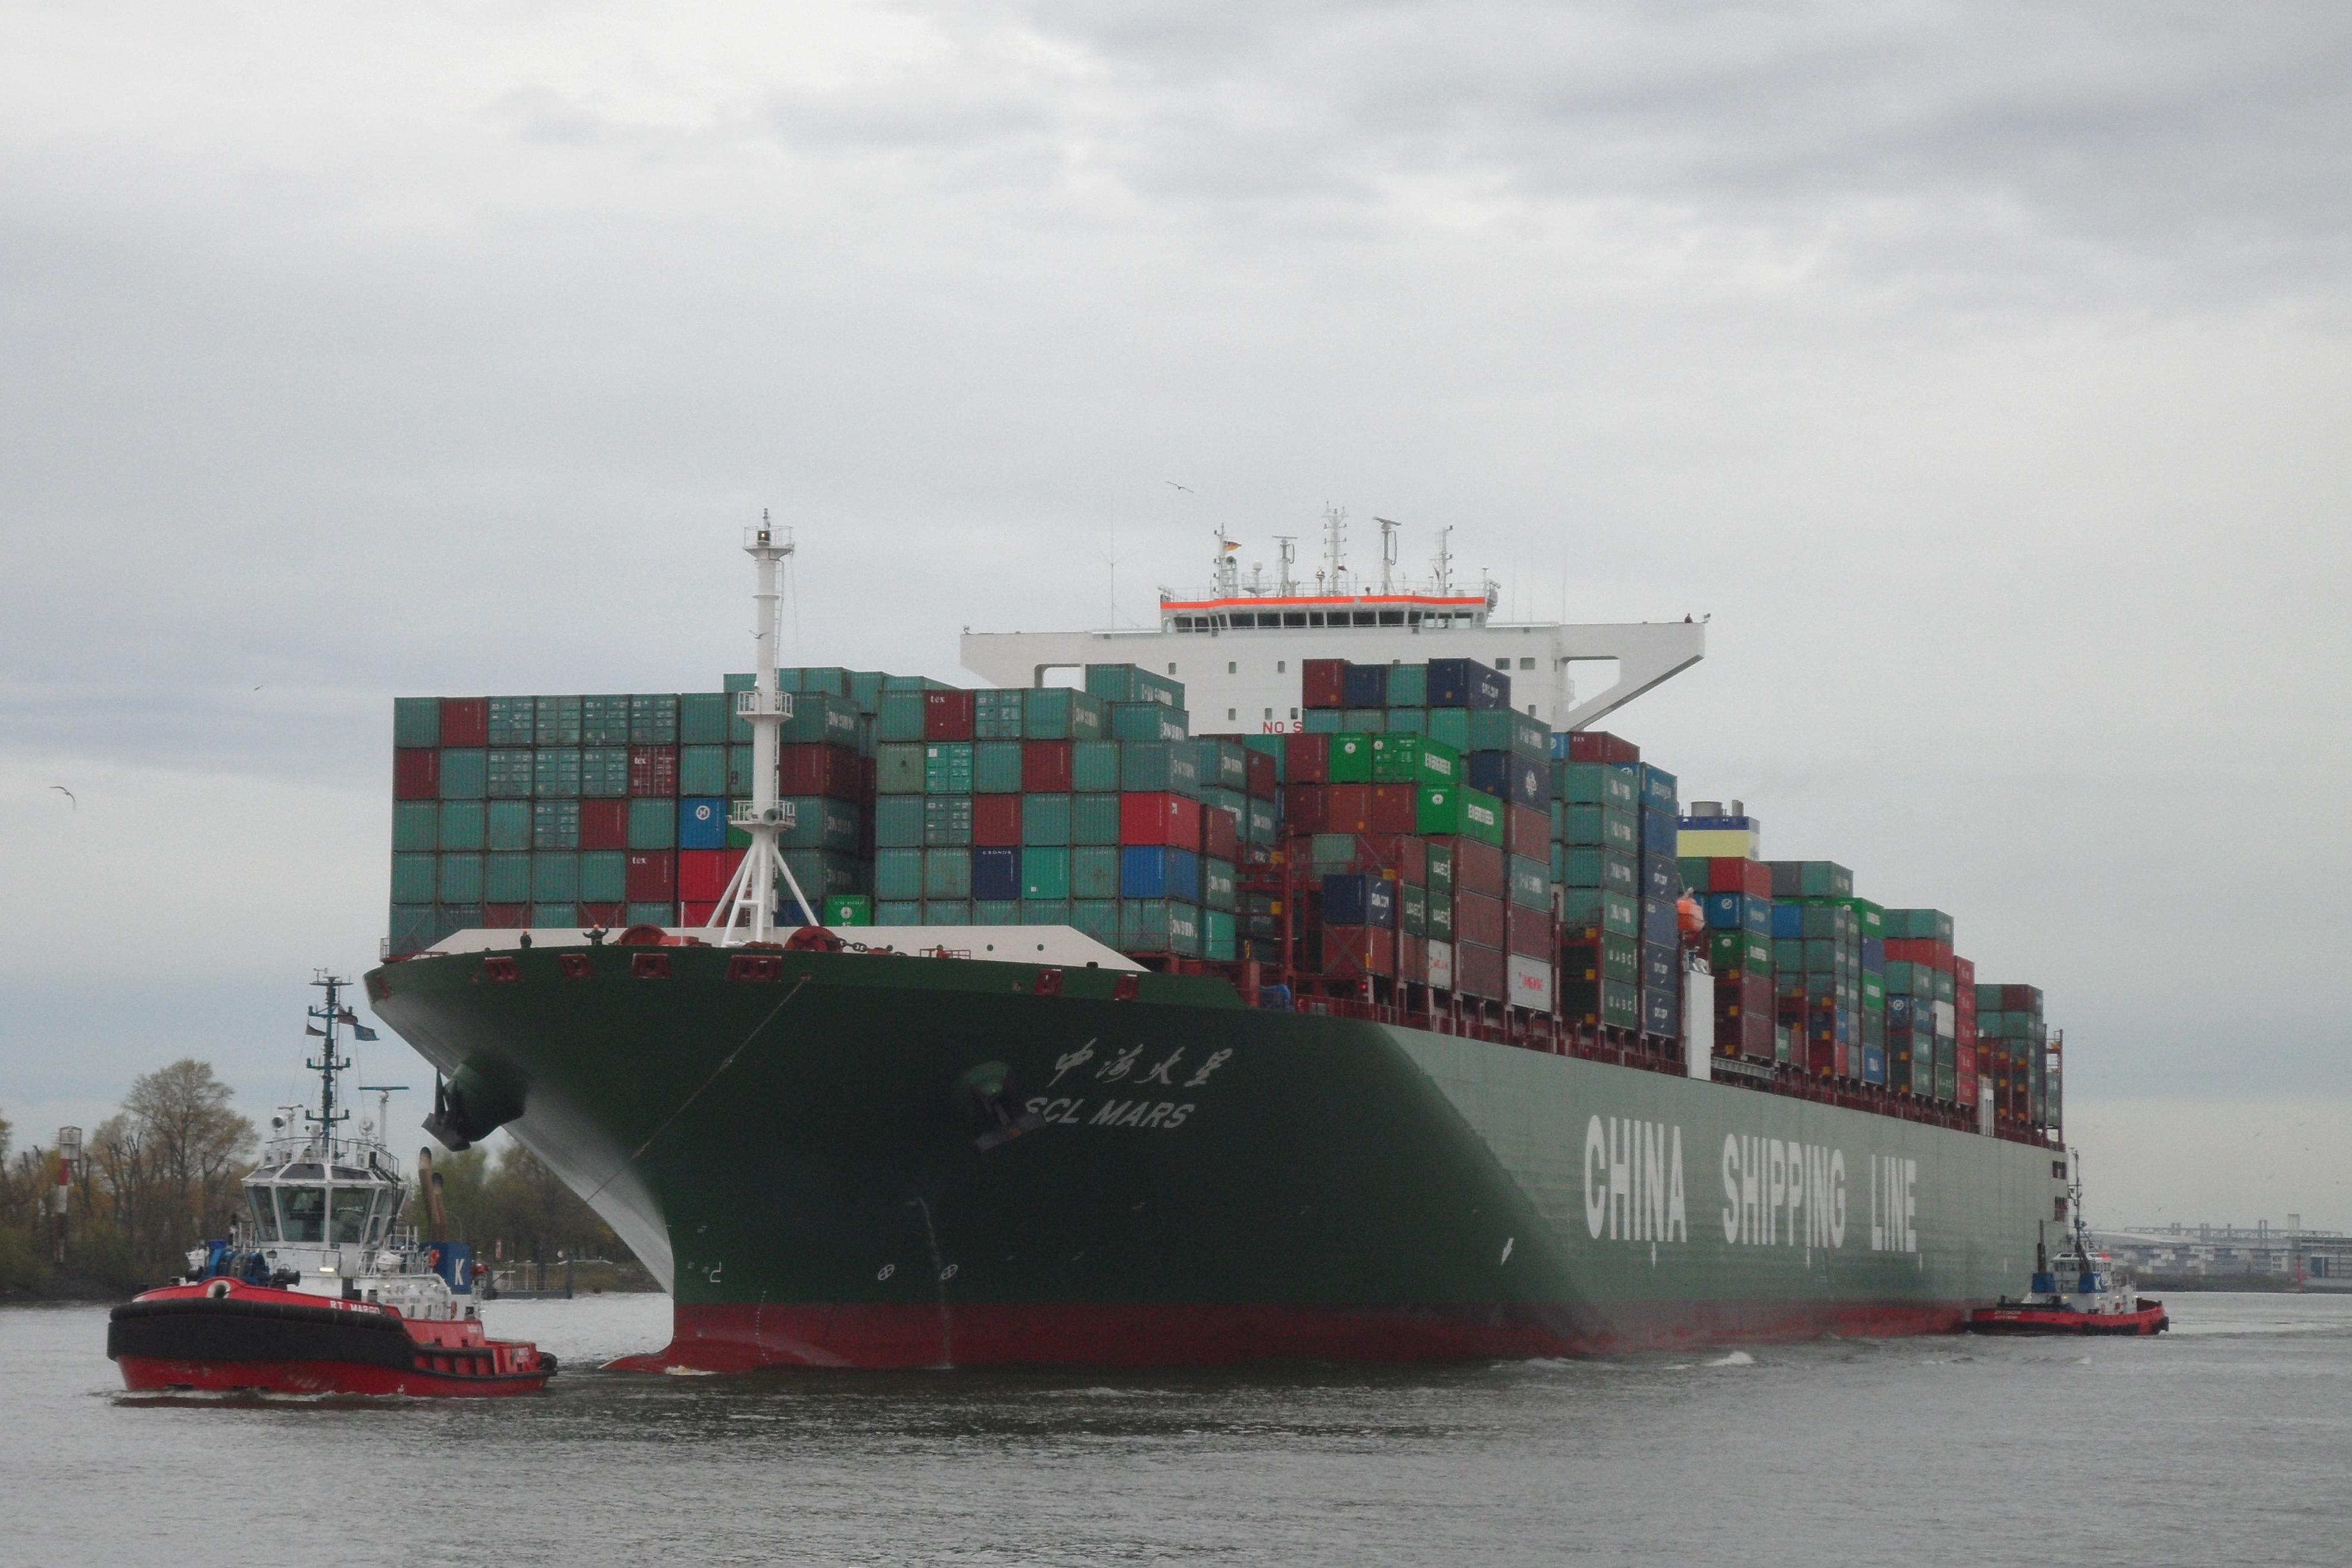 China shipping lines alex72 форекс москва